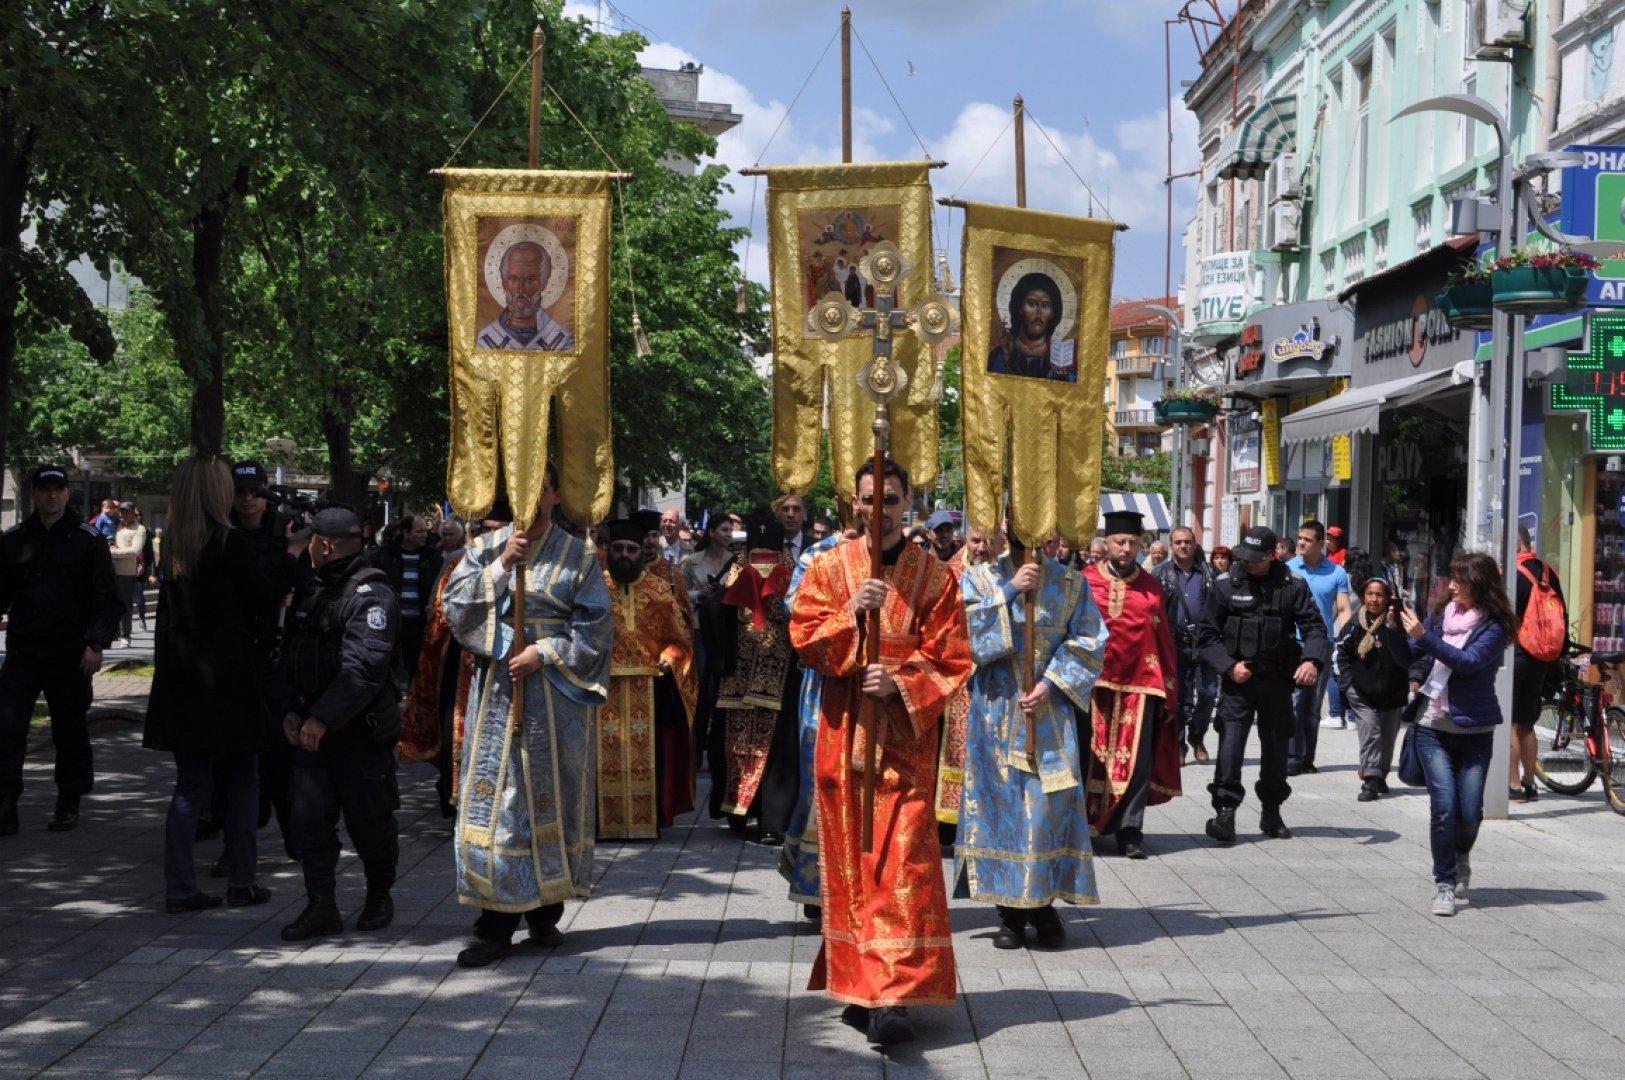 На 6 май отдаваме почит на свети Георги Победоносец. Снимка Община Бургас